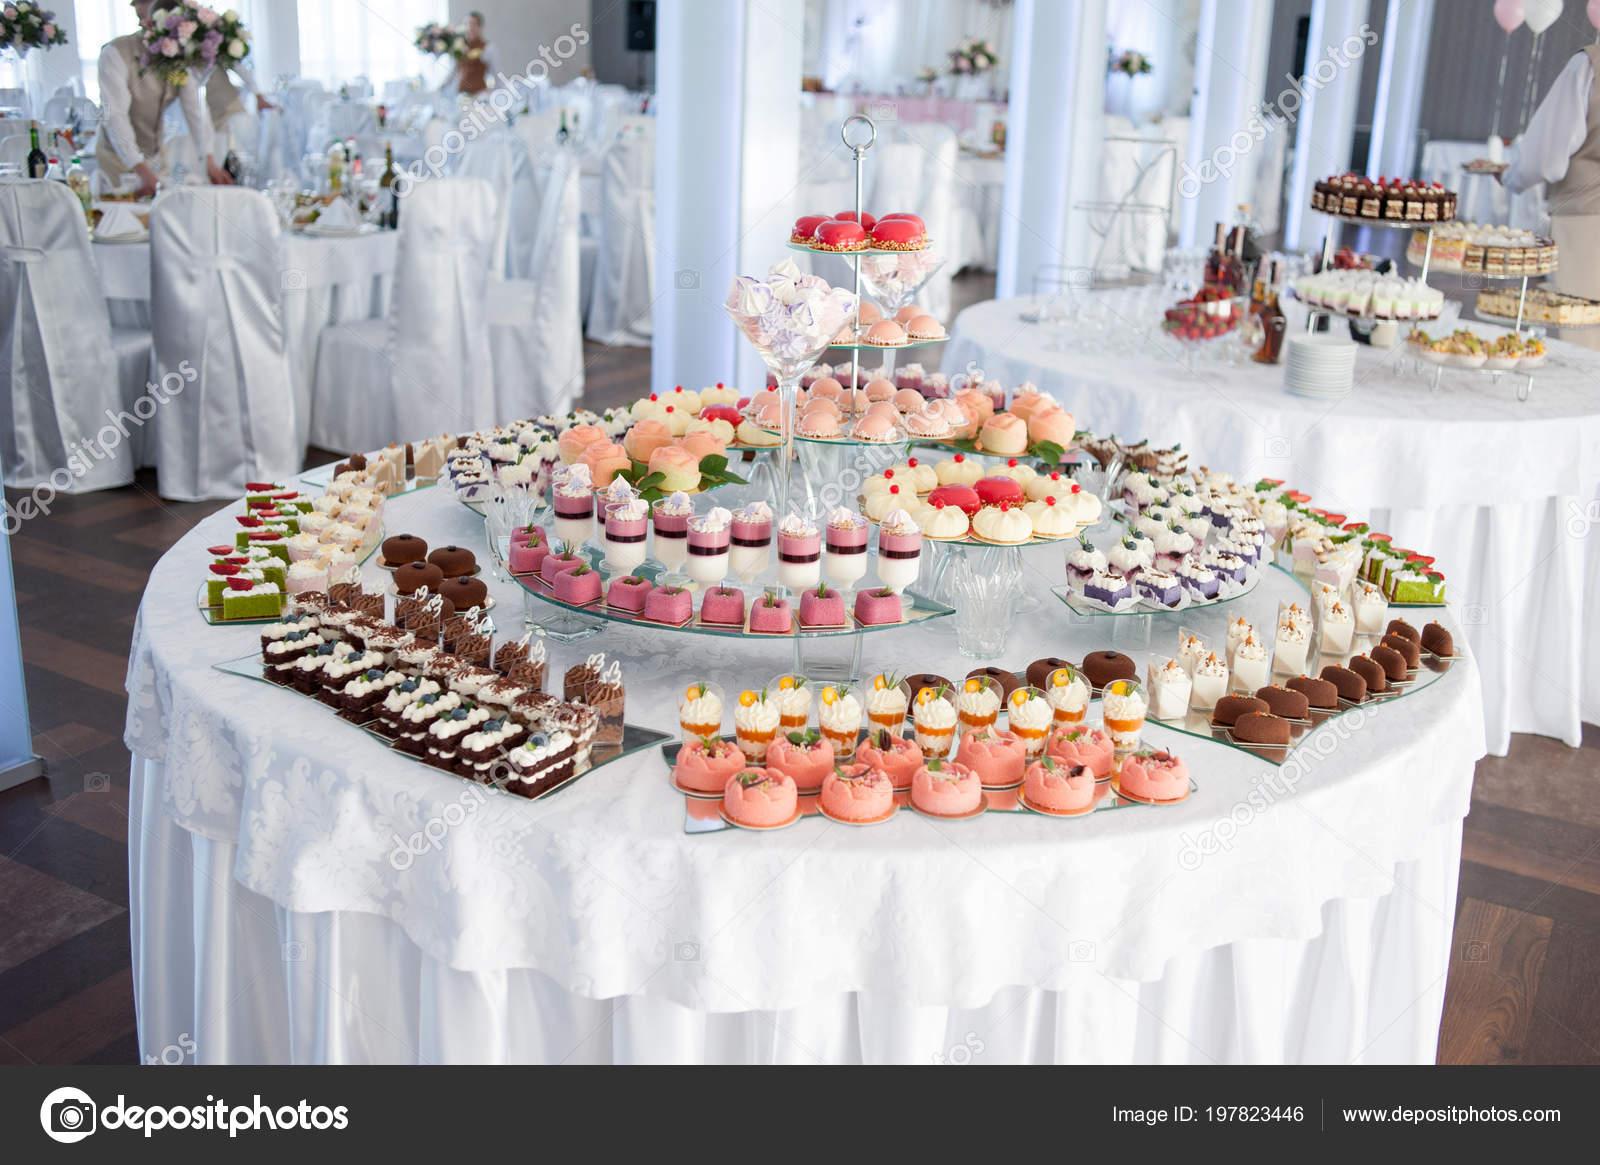 Marvelous Wedding Dessert Bar Candy Buffet Wedding Sweets Table Home Interior And Landscaping Spoatsignezvosmurscom